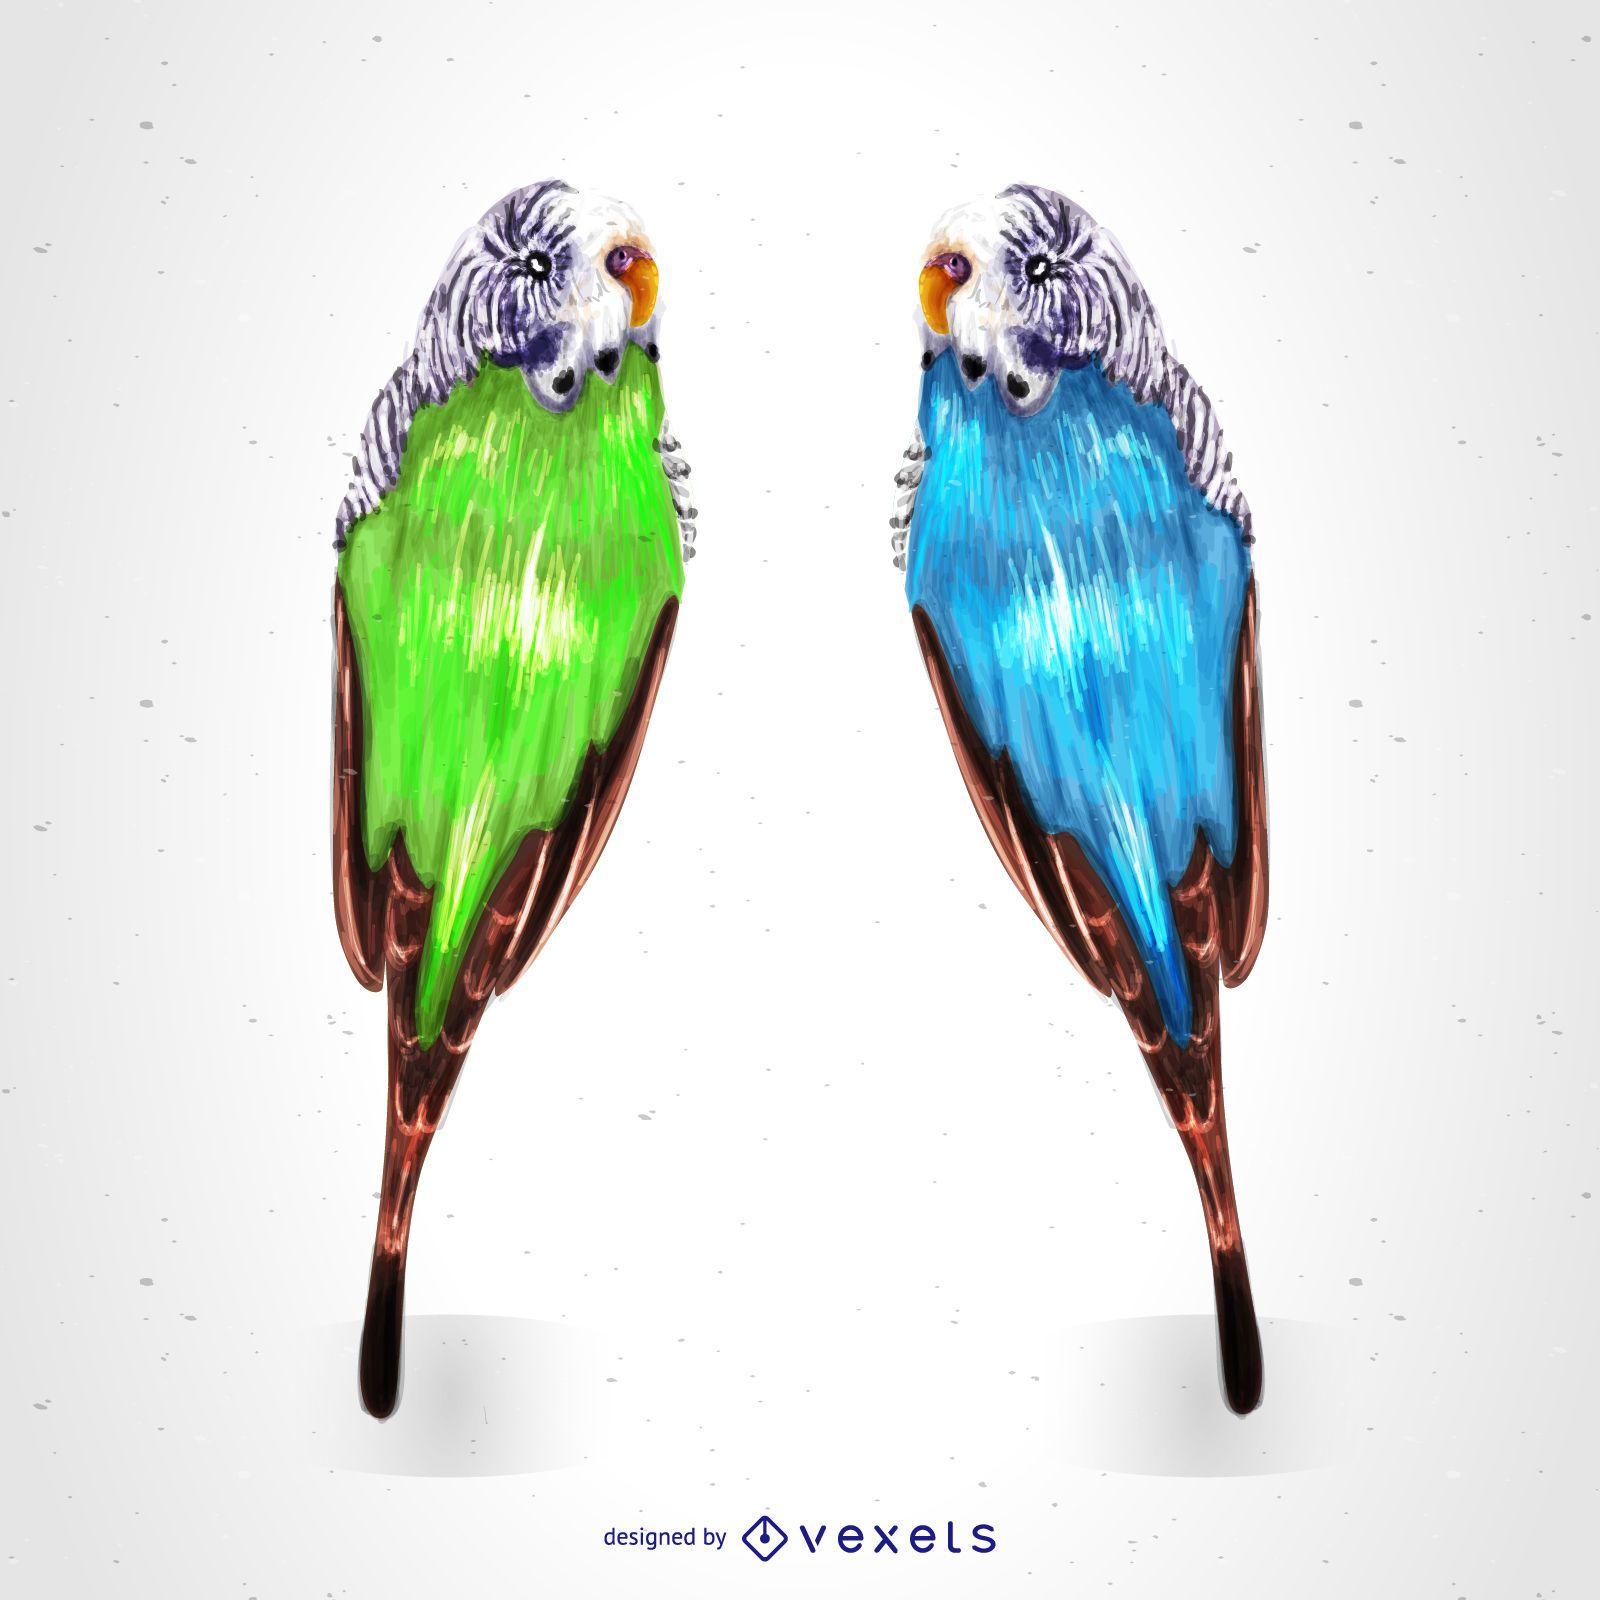 Tropical parrots drawing